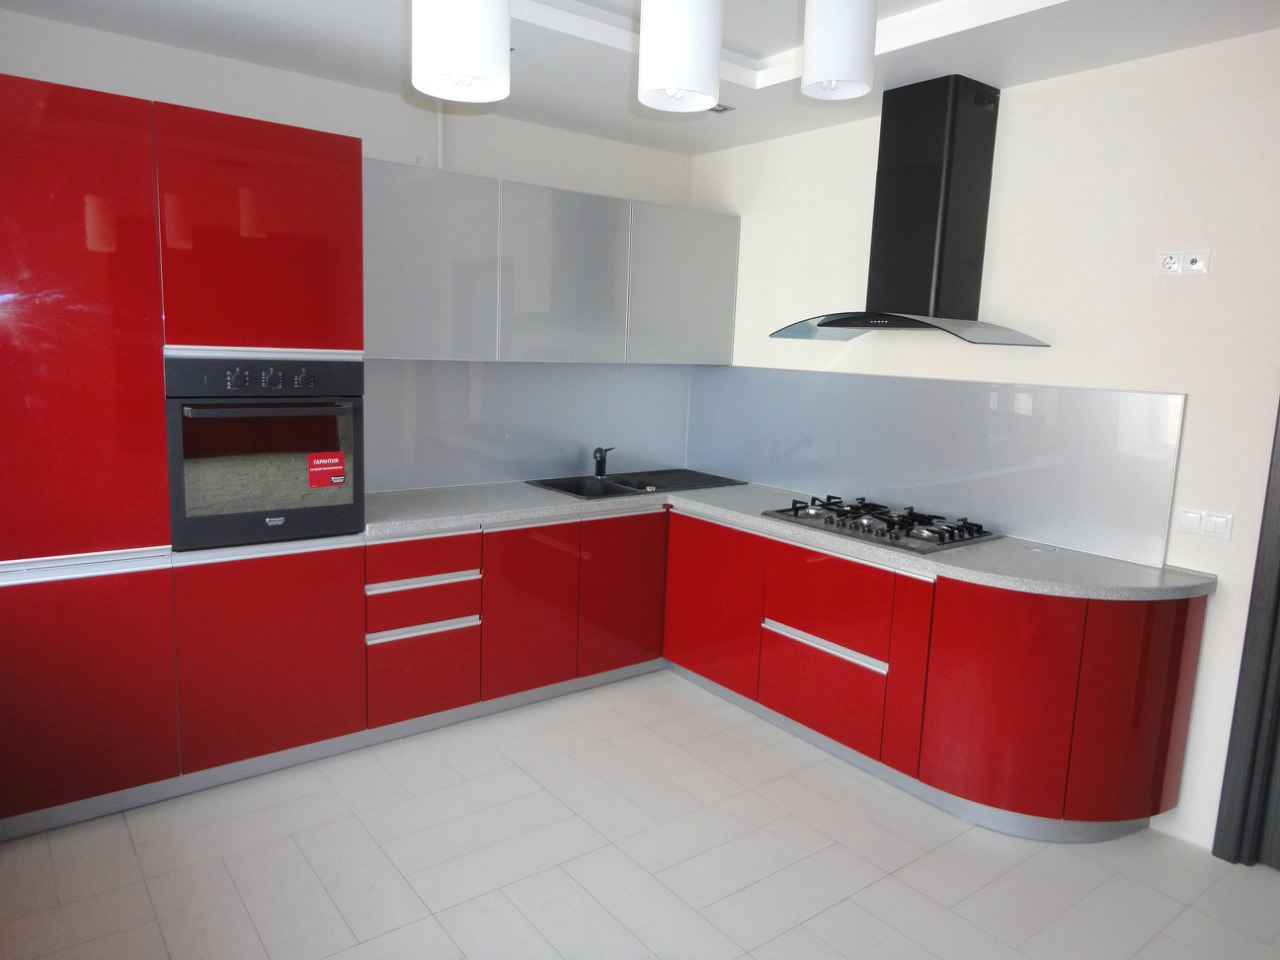 Кухни из эмали фото